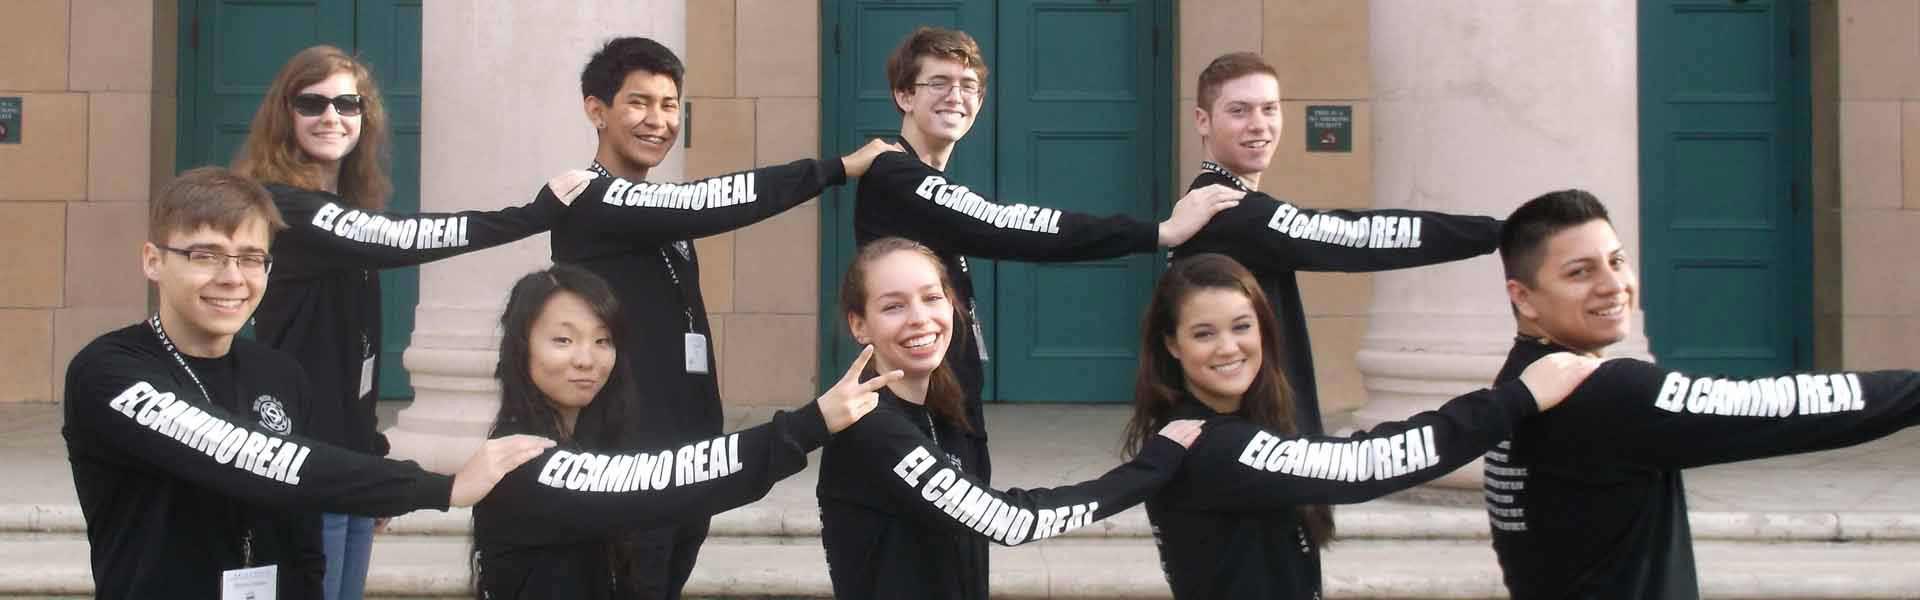 Elcaminoreal-Highschool-CA-students-Banner-Main